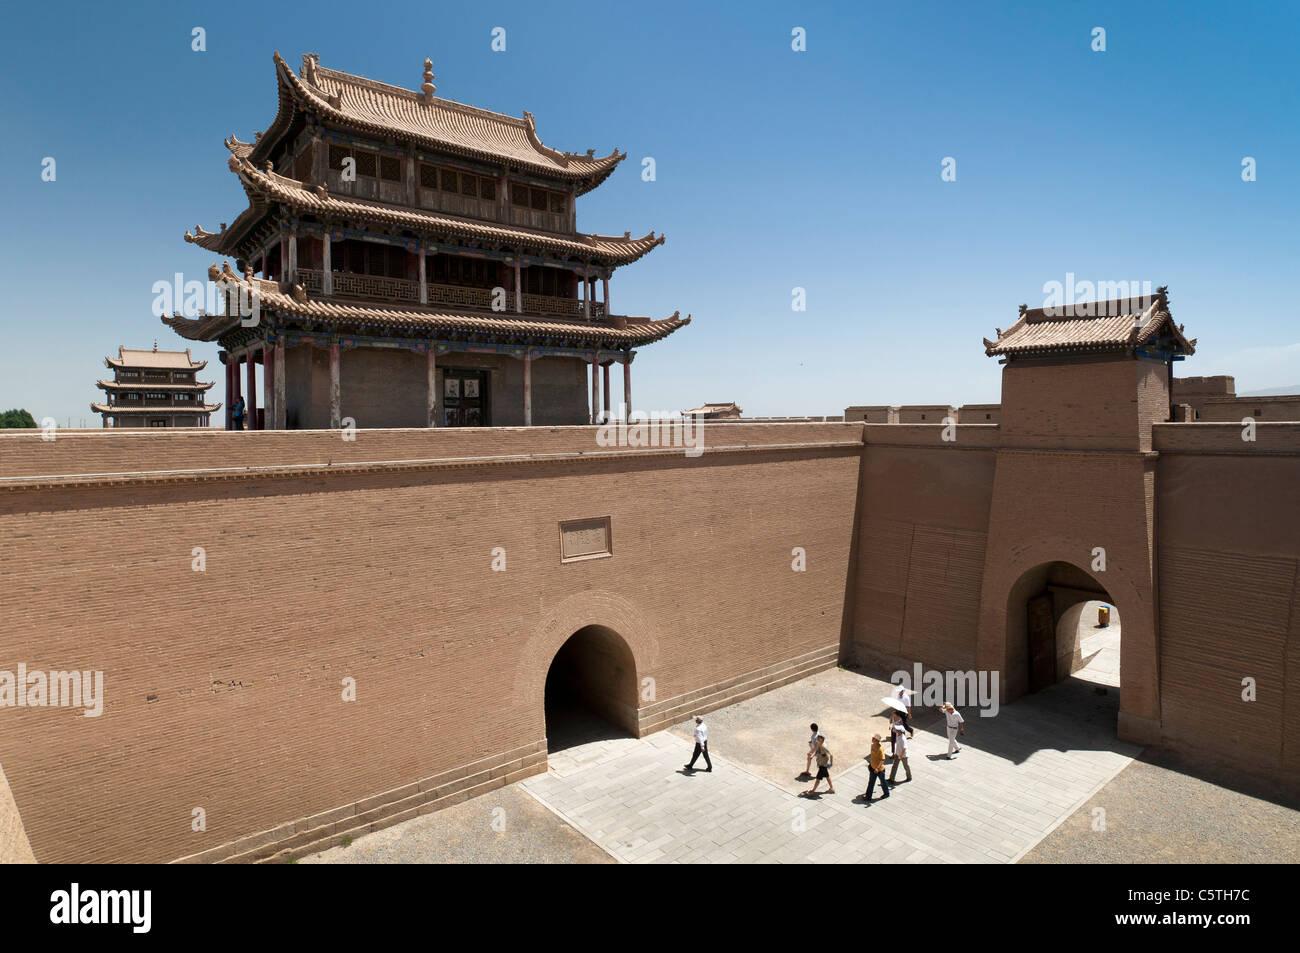 Rammed earth walls tower above courtyard at Jiayuguan Fort, part of Great Wall of China, Jiayuguan, Gansu Province, - Stock Image